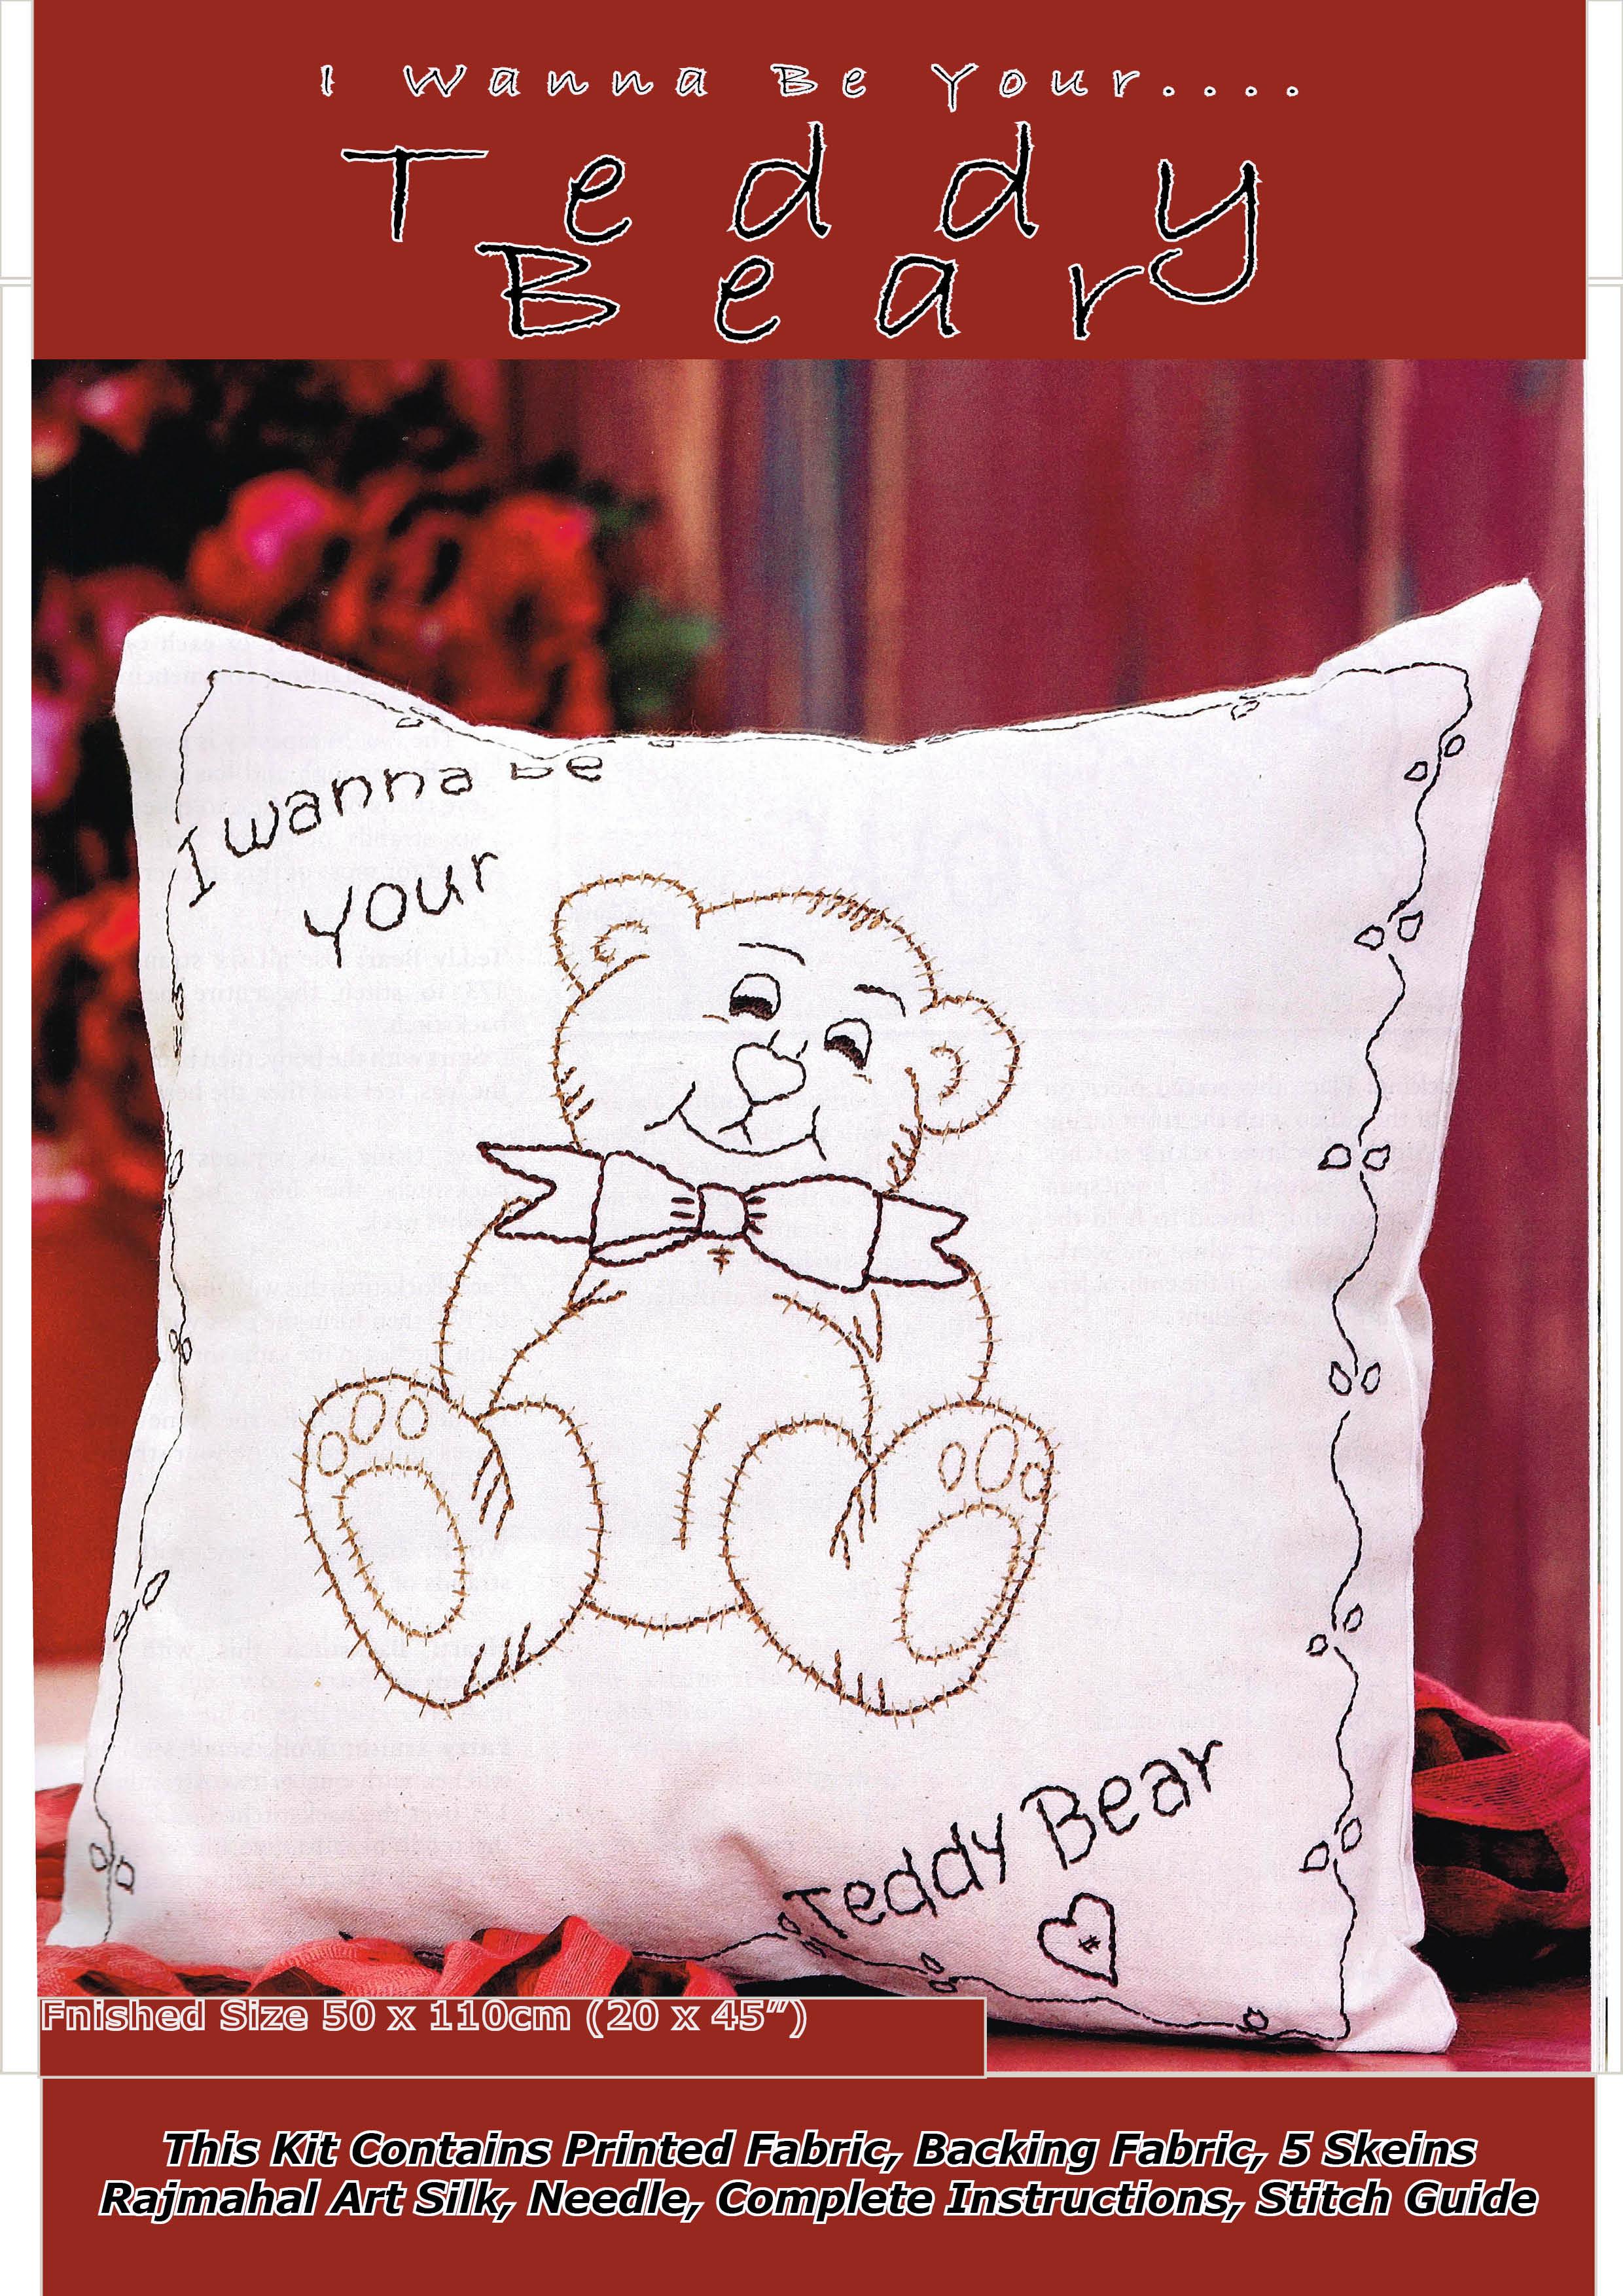 teddybearkitcoversmall.jpg